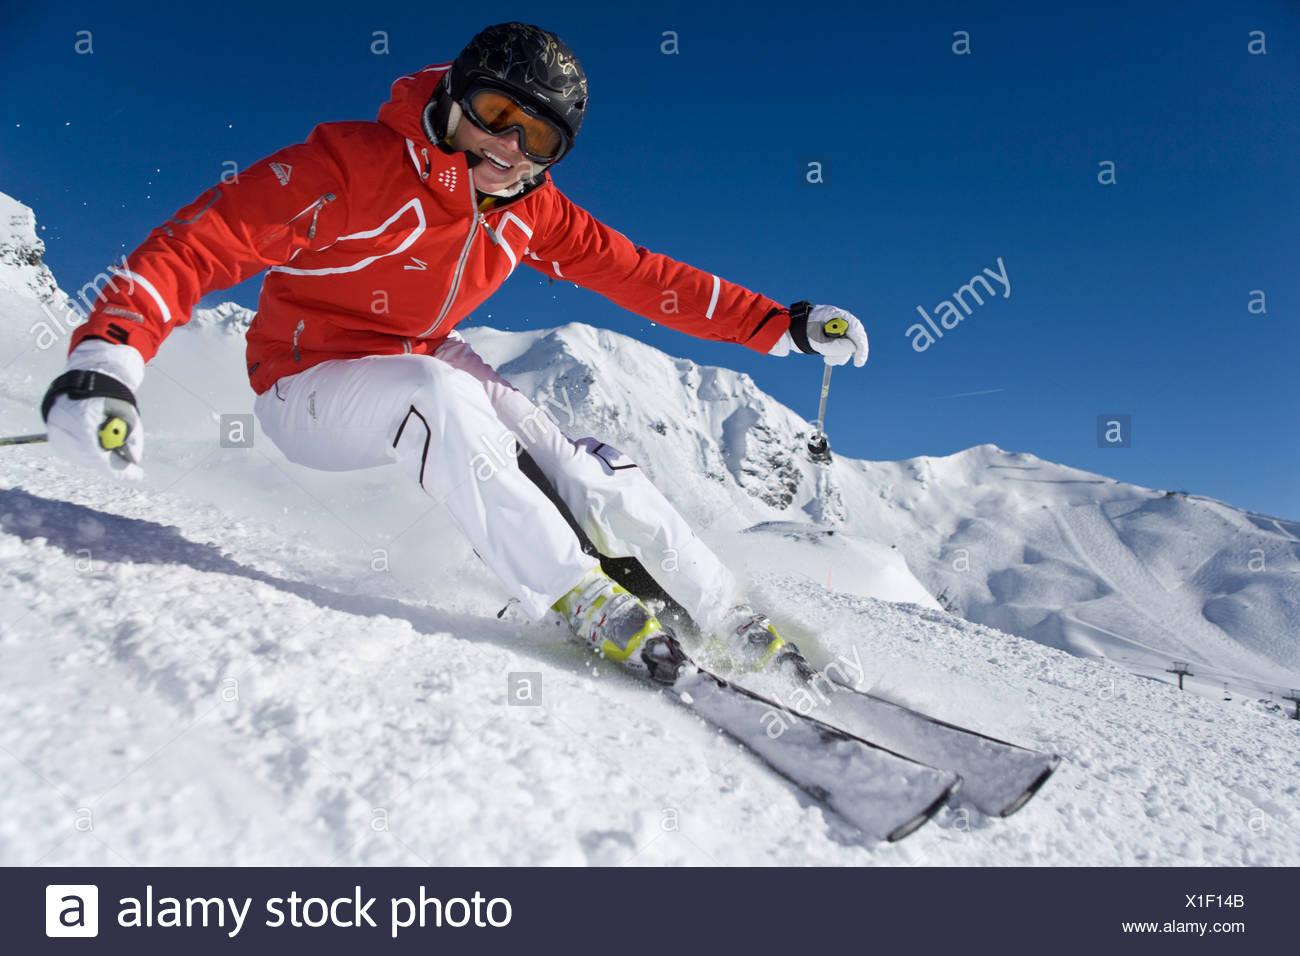 Woman ski carving skiing winter sports